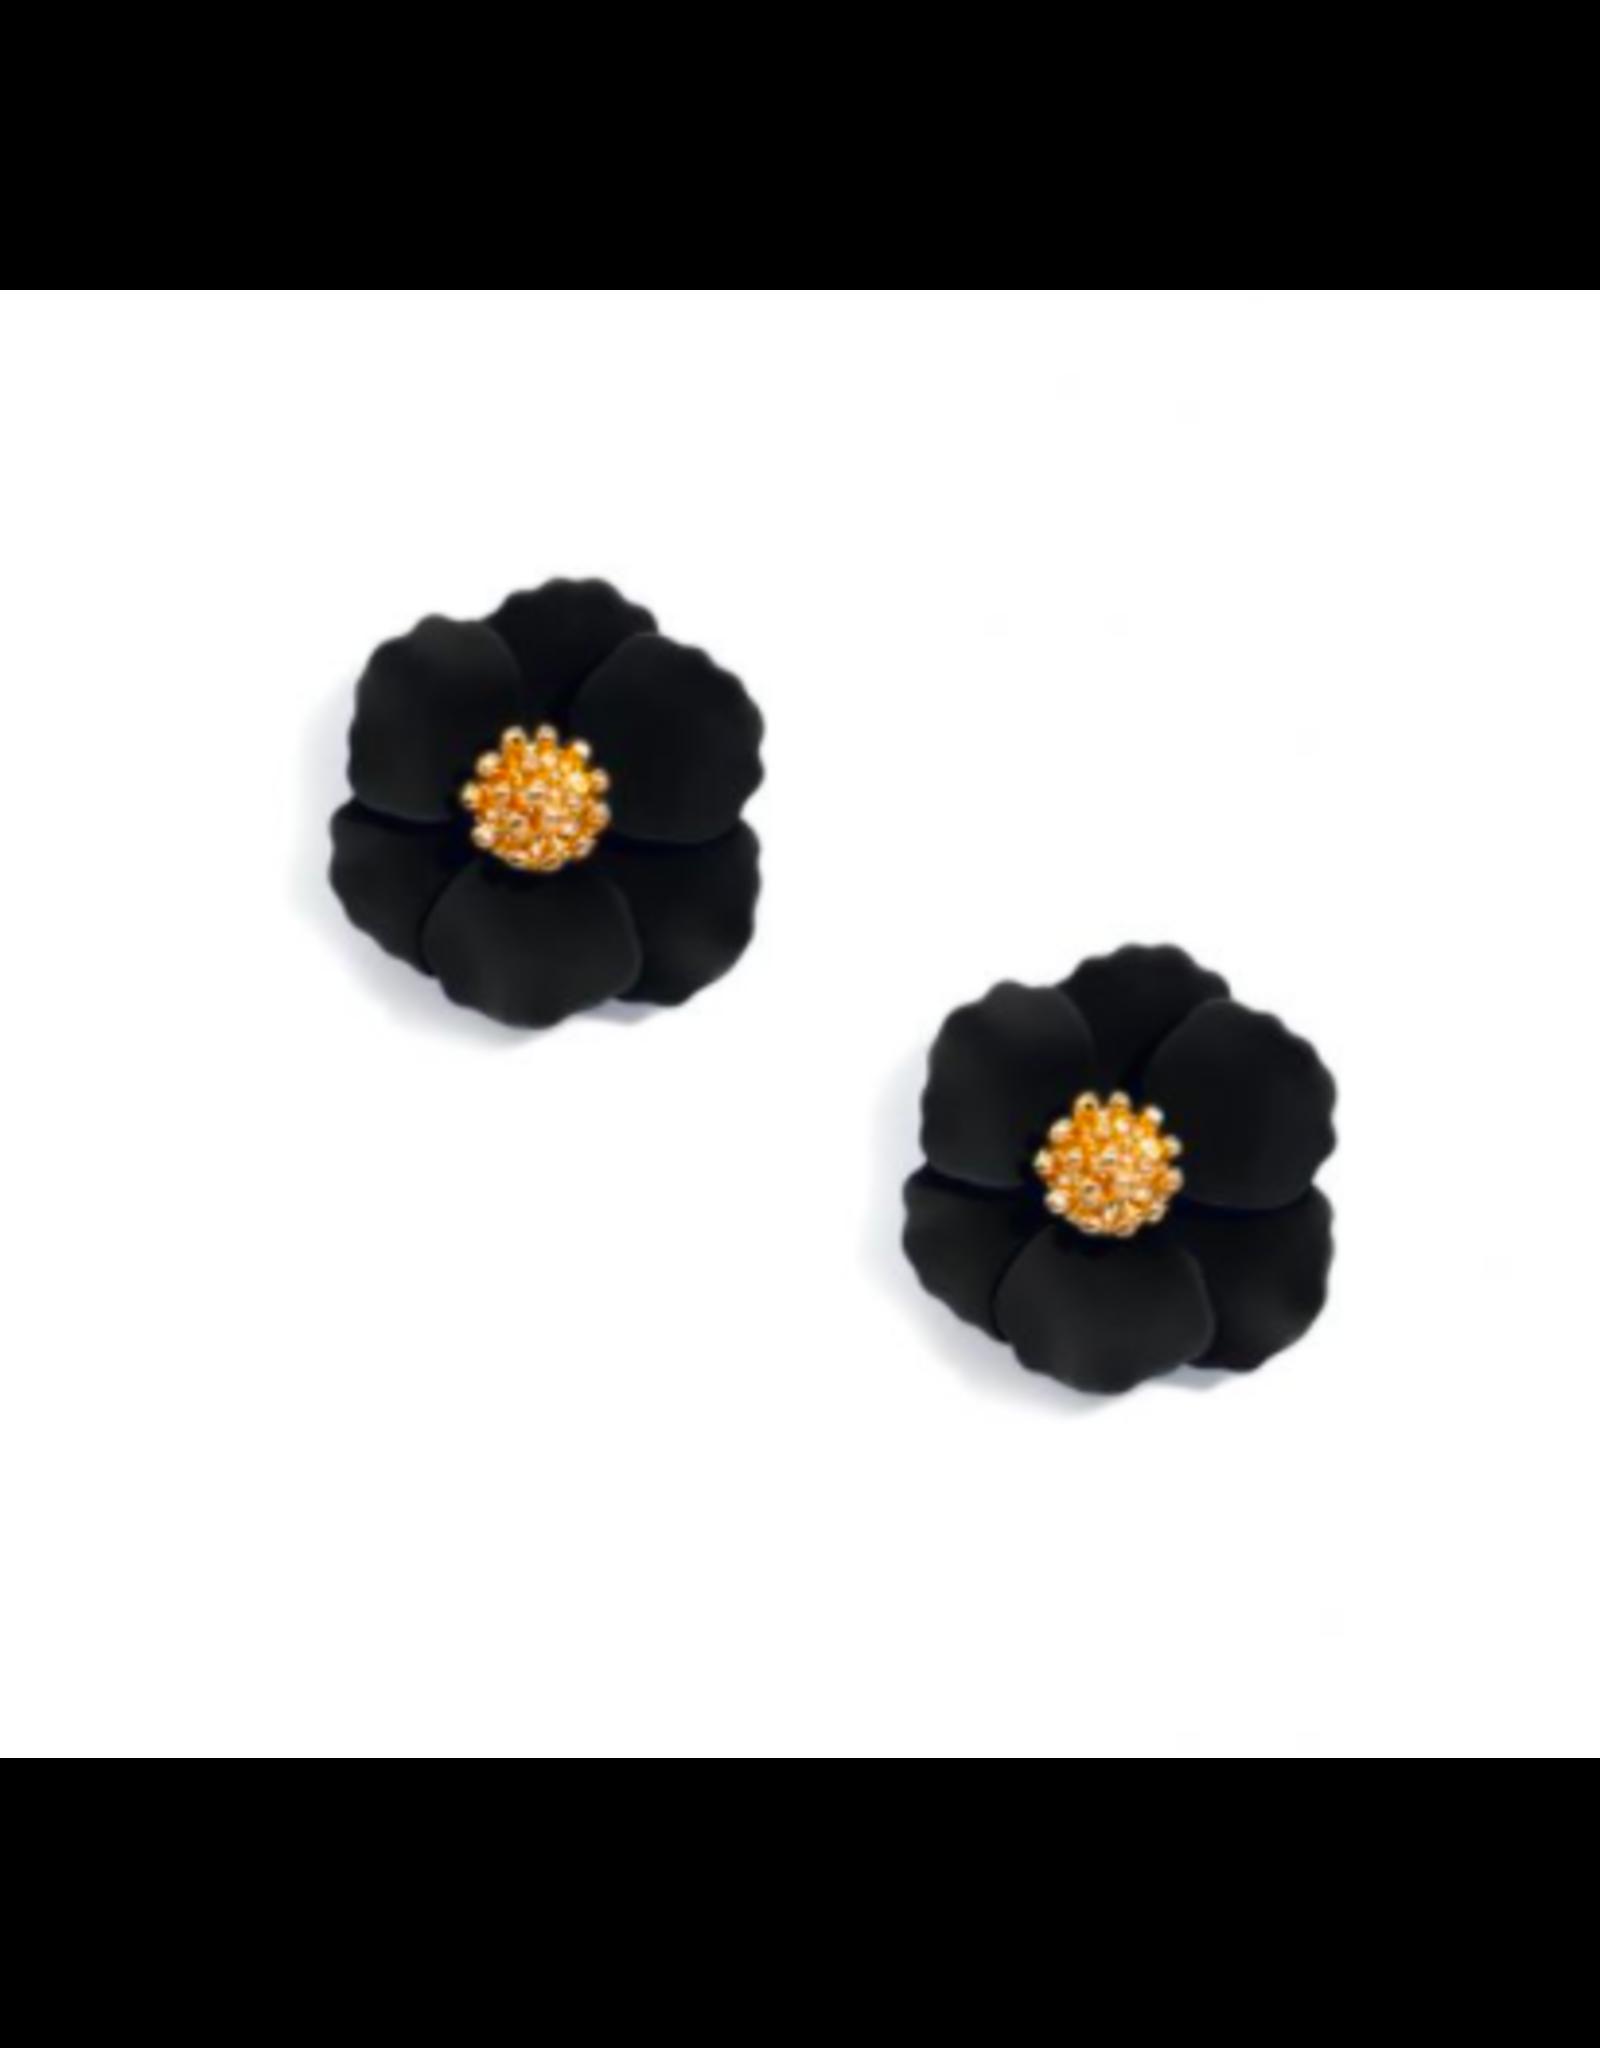 Zenzii Tiny Flower Earring in Black